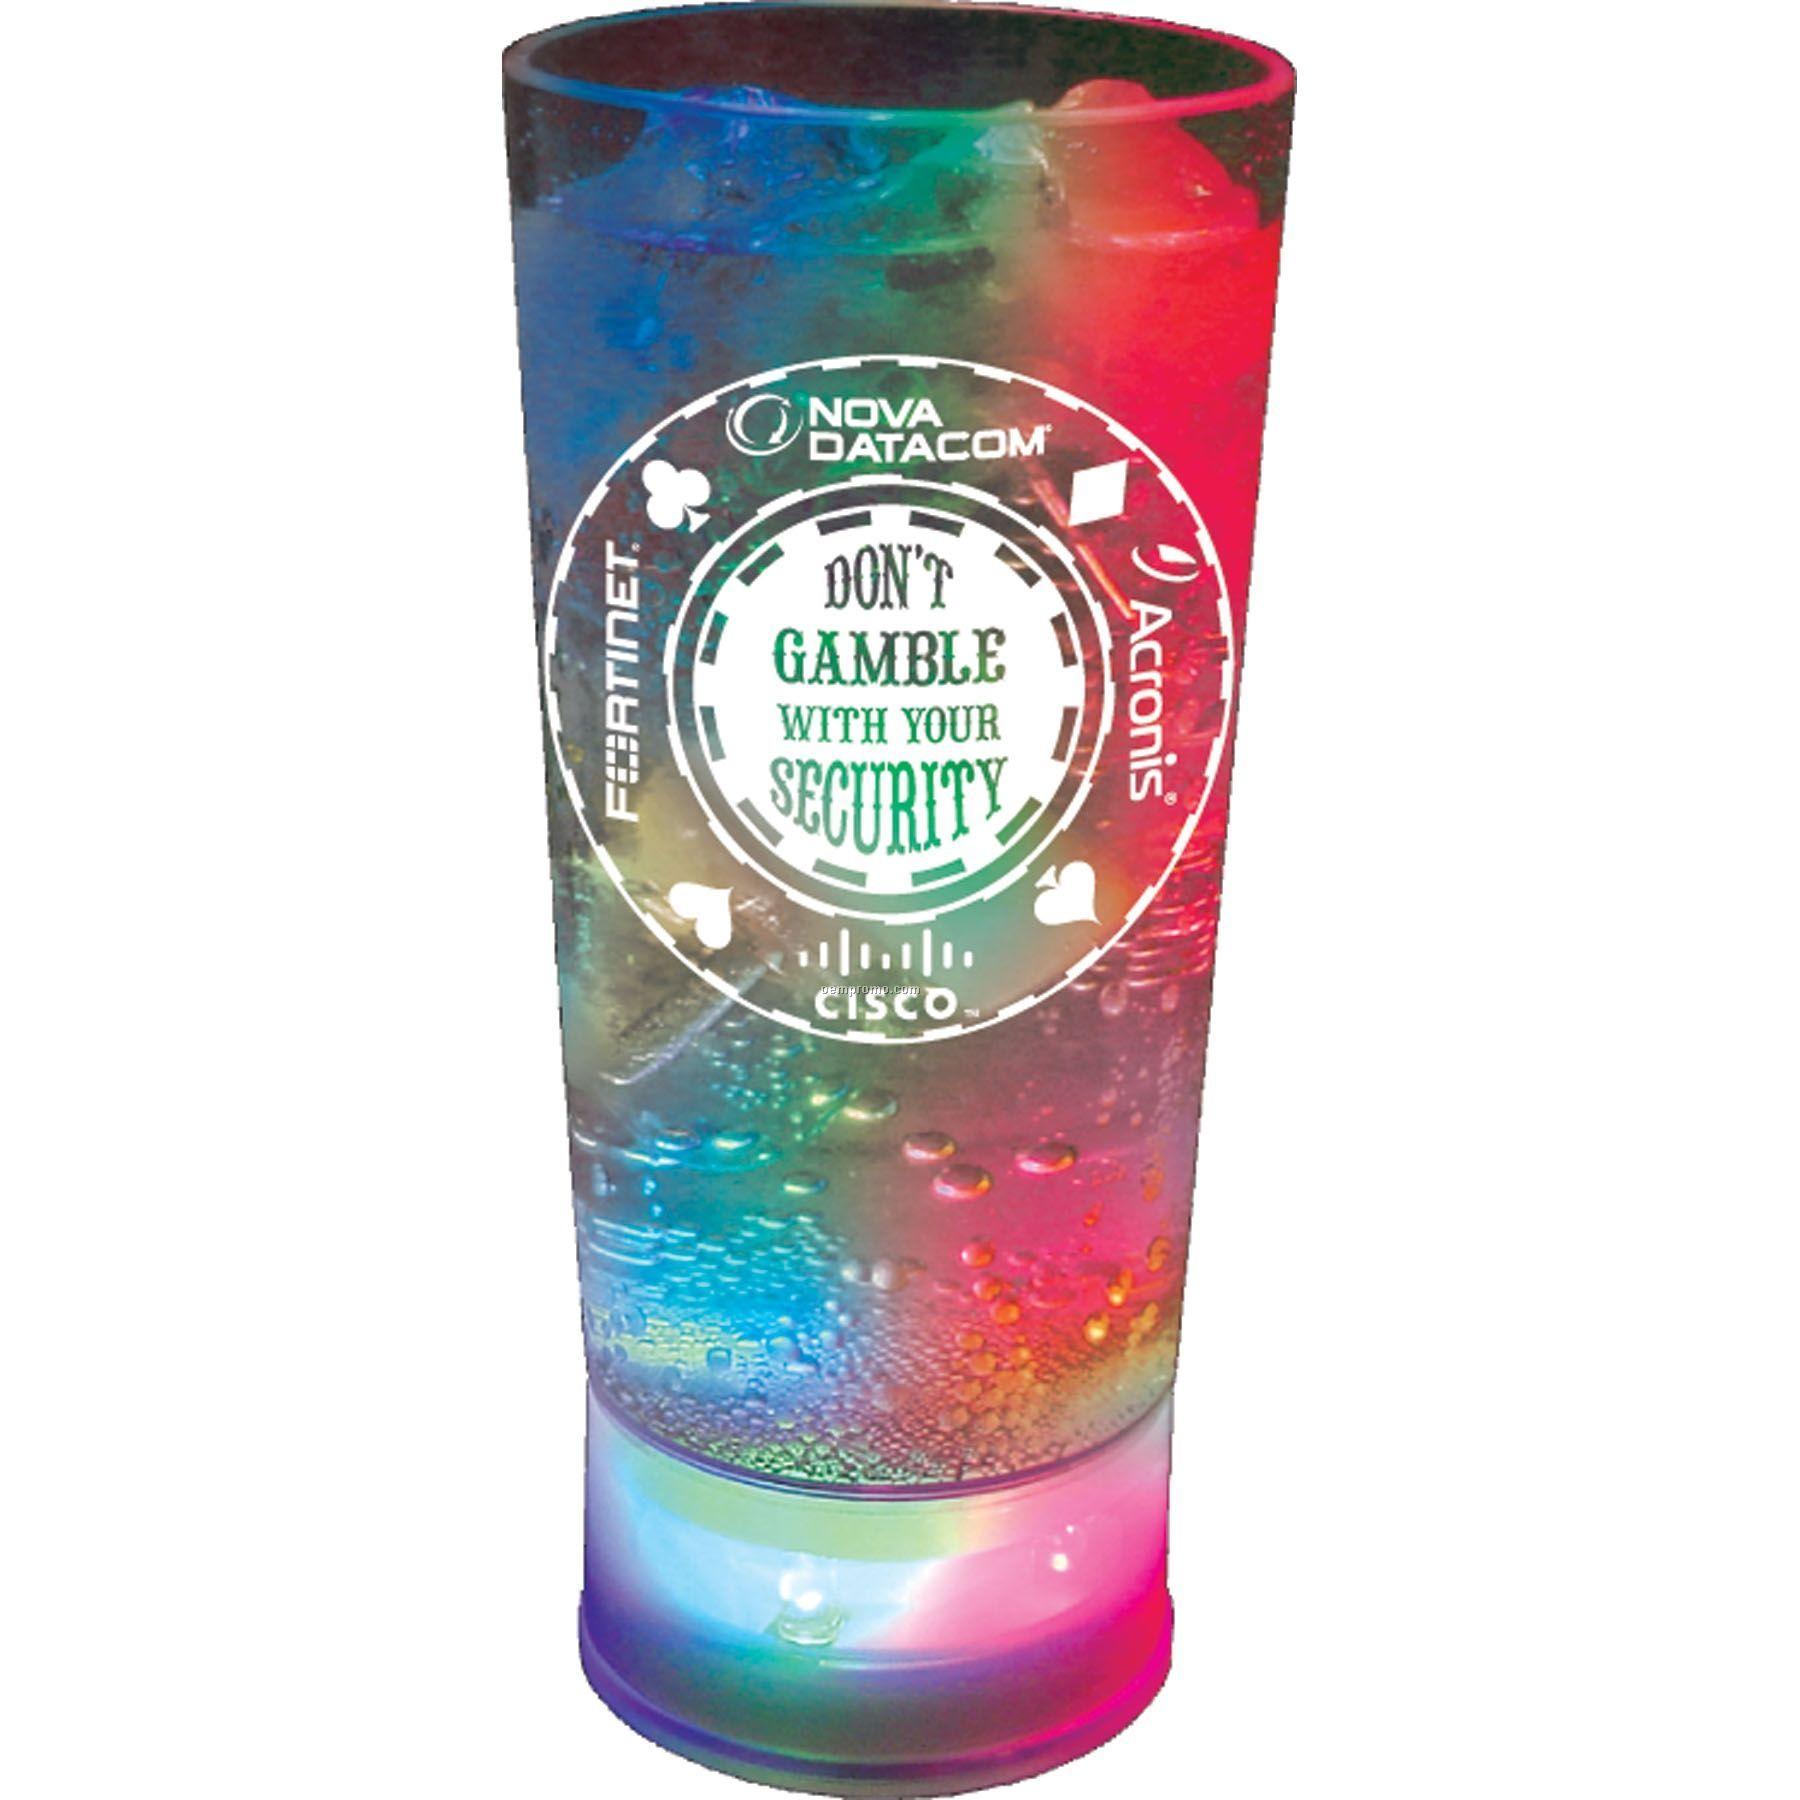 10 Oz. 3-light Cup